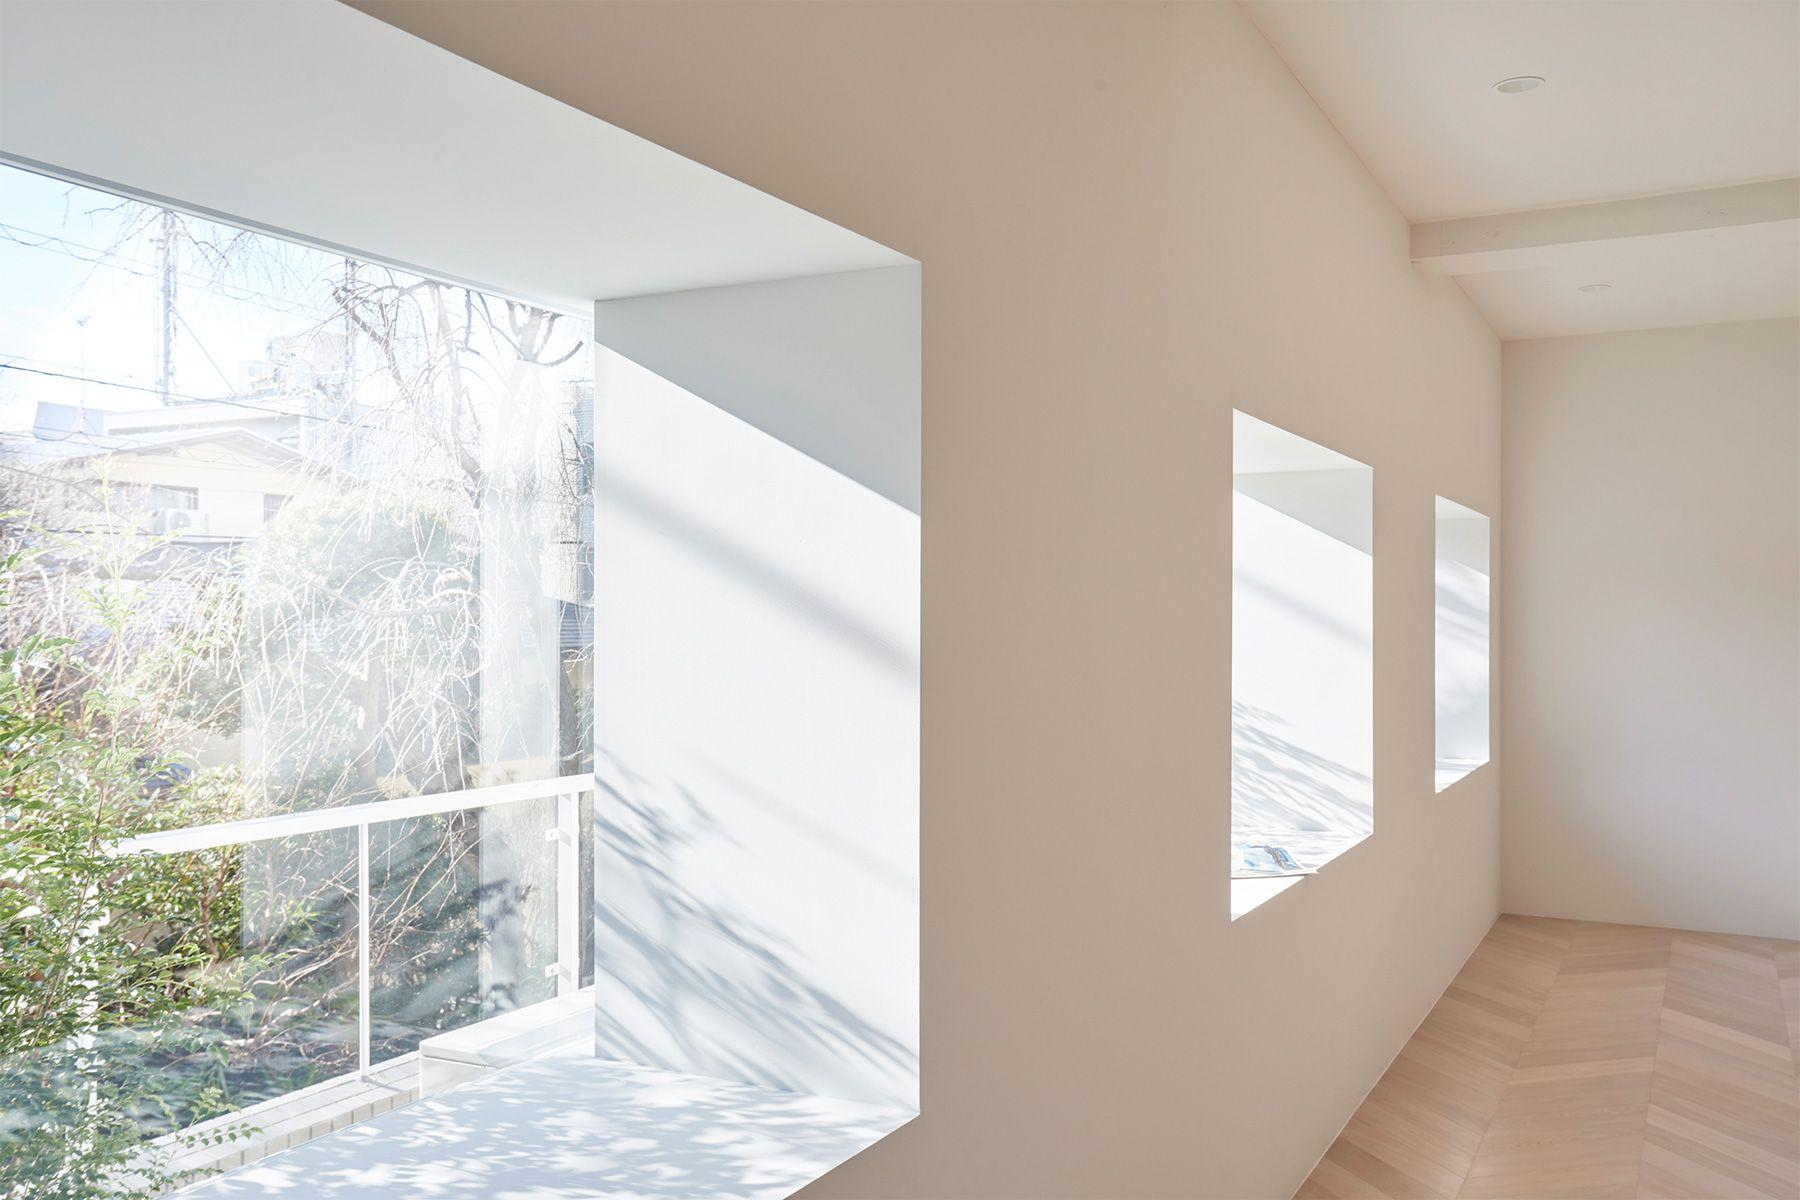 Haku Studio / THE HOUSE (ハクスタジオ)美術館のような窓